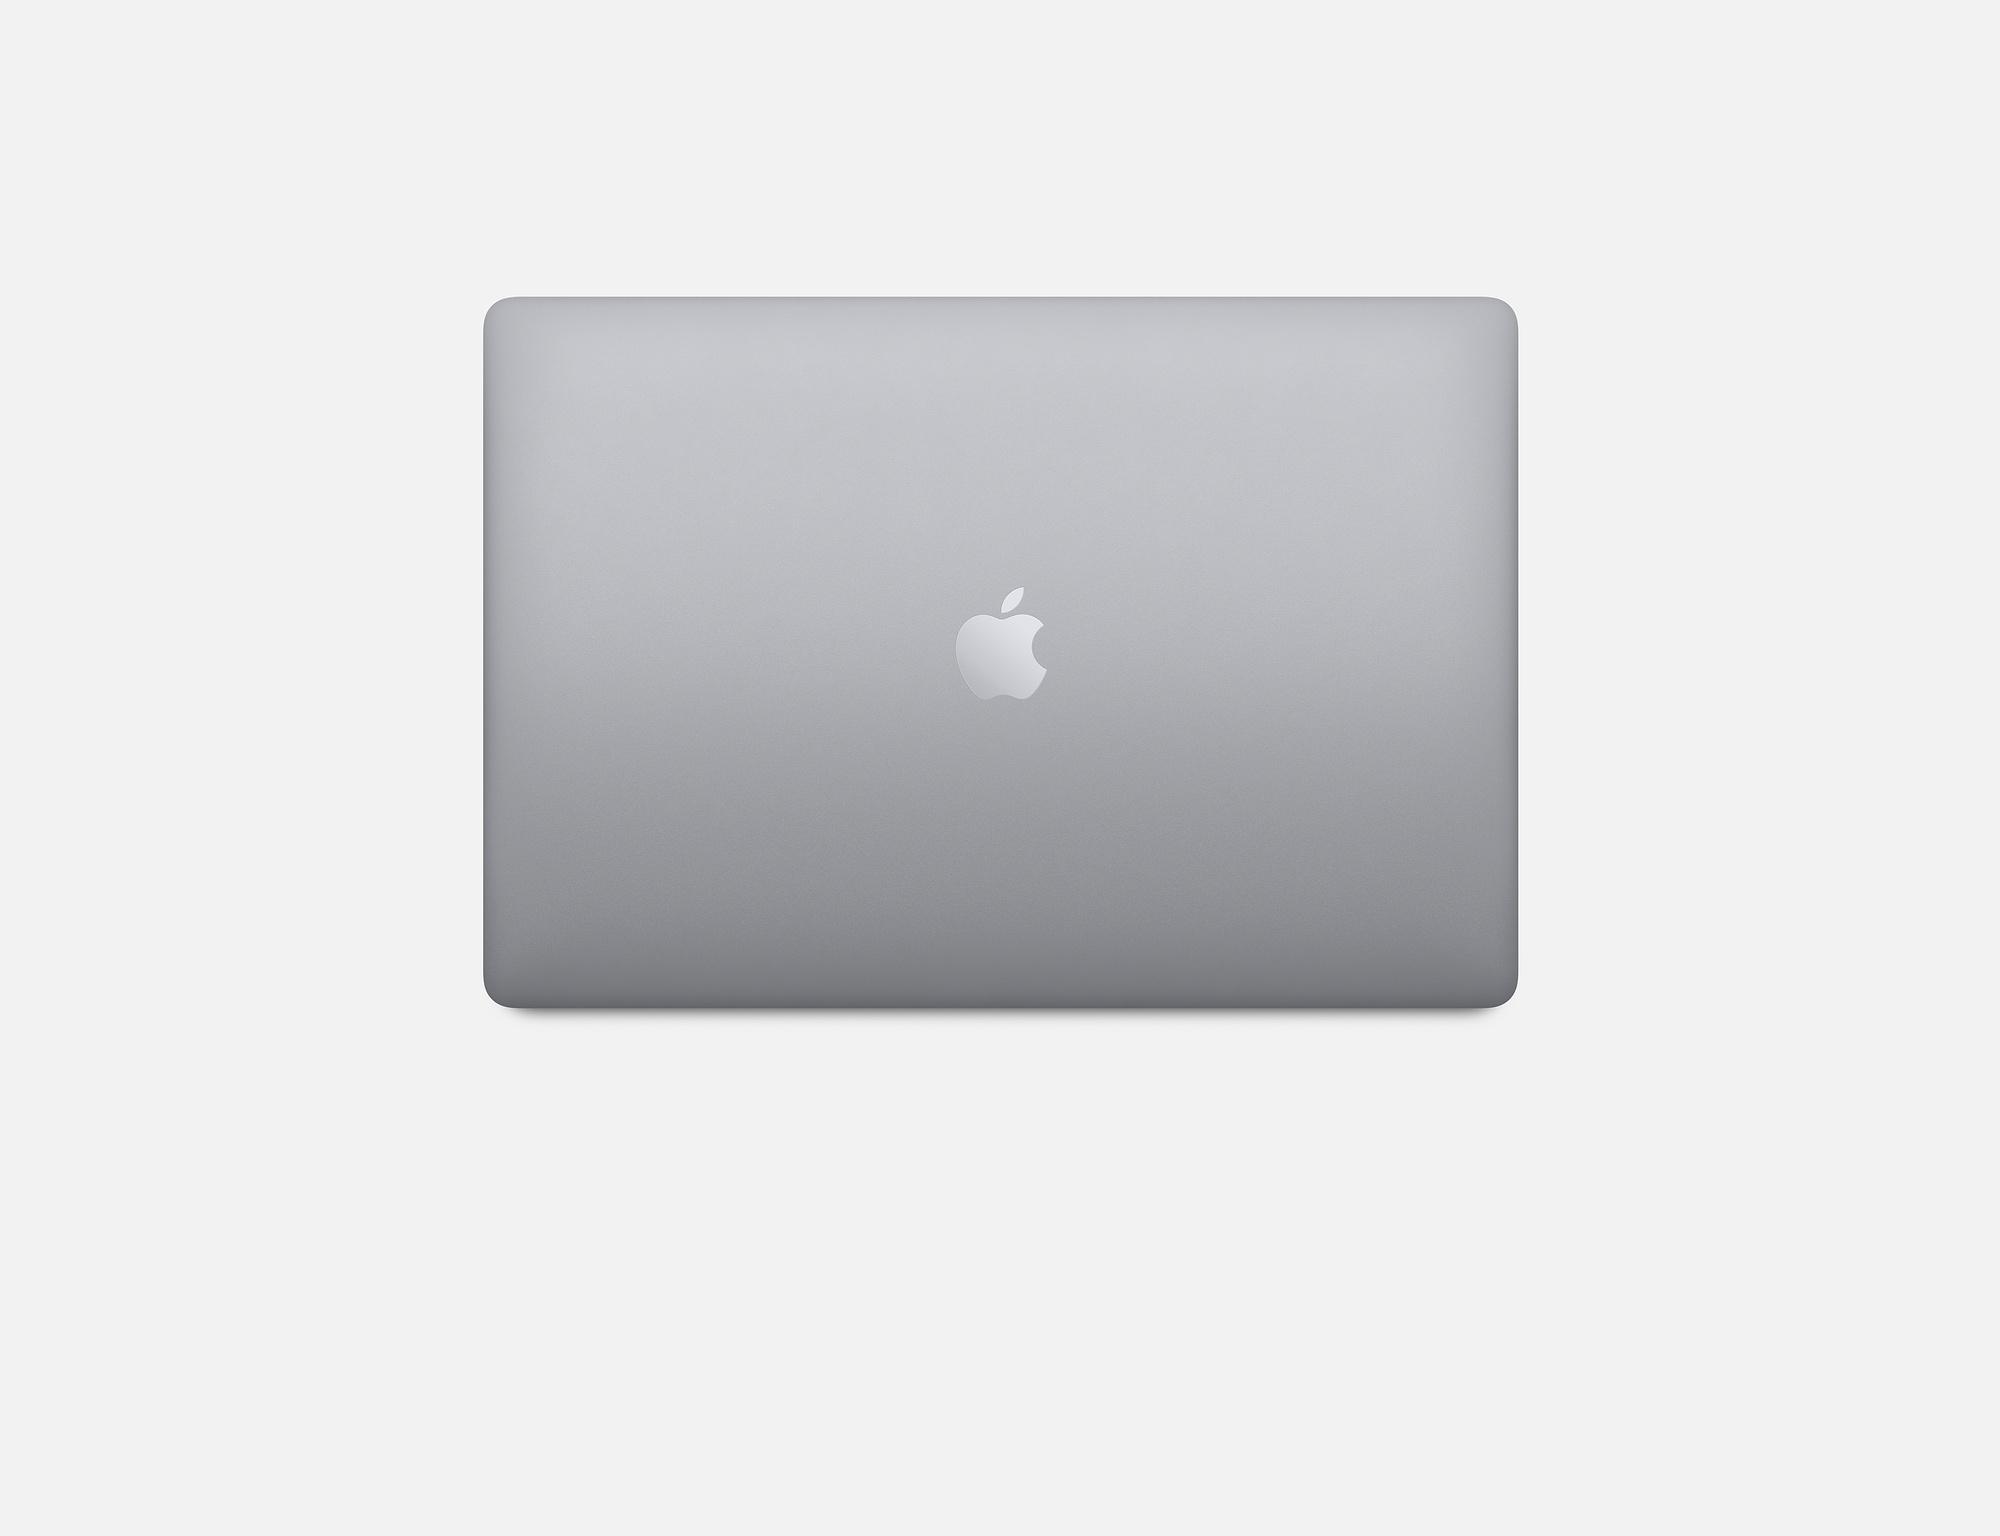 MacBook Pro 16 inch Space Gray 1TB MVVK2